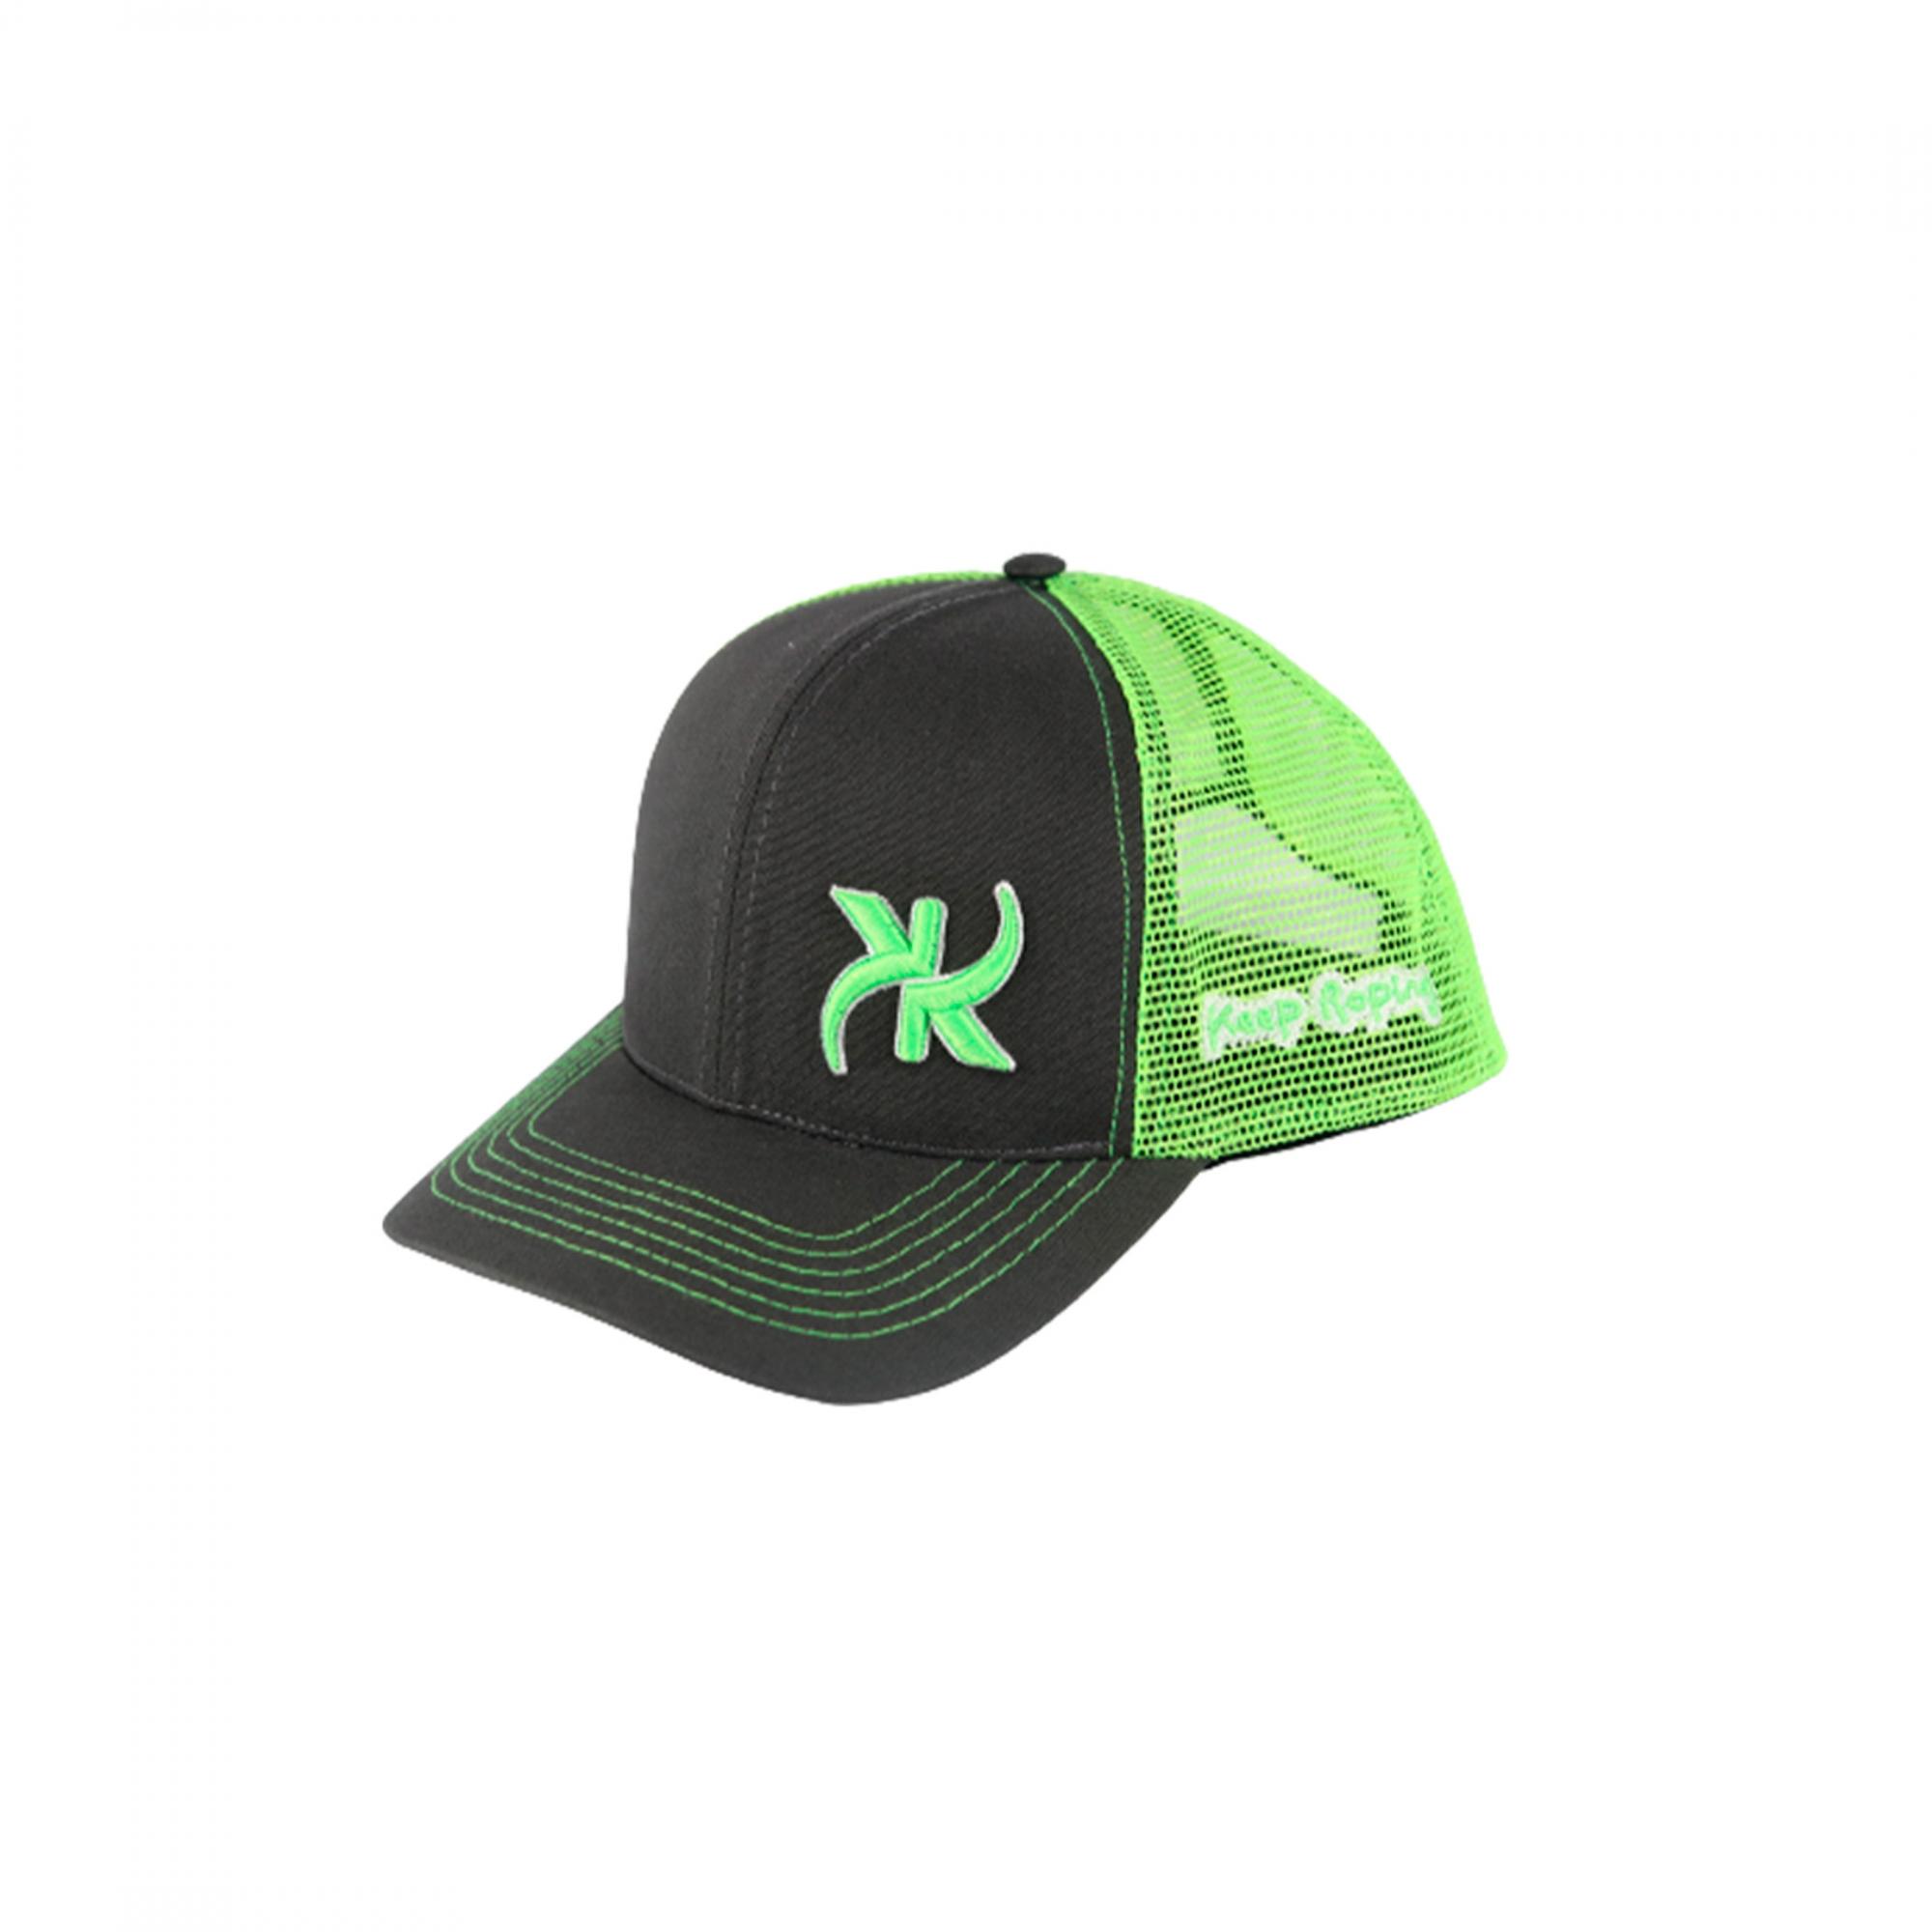 Boné Keep Roping Trucker Hat com aba curva Chumbo/Verde